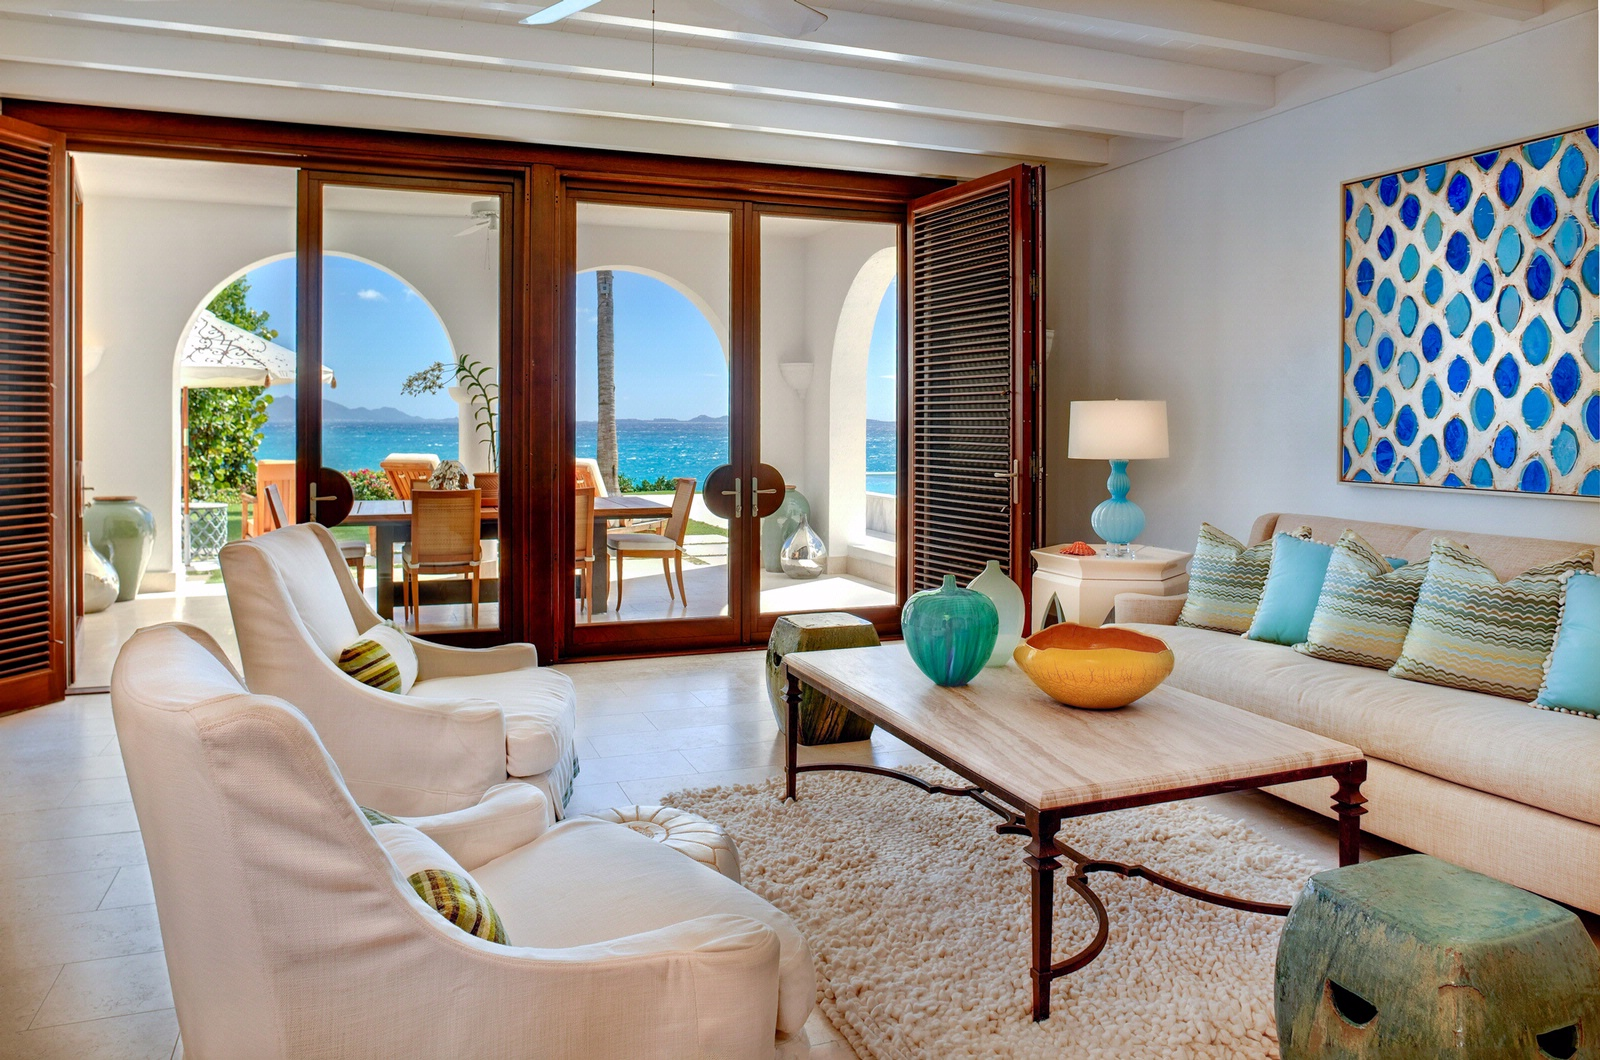 Deco salon bleu marine for Deco sejour bleu